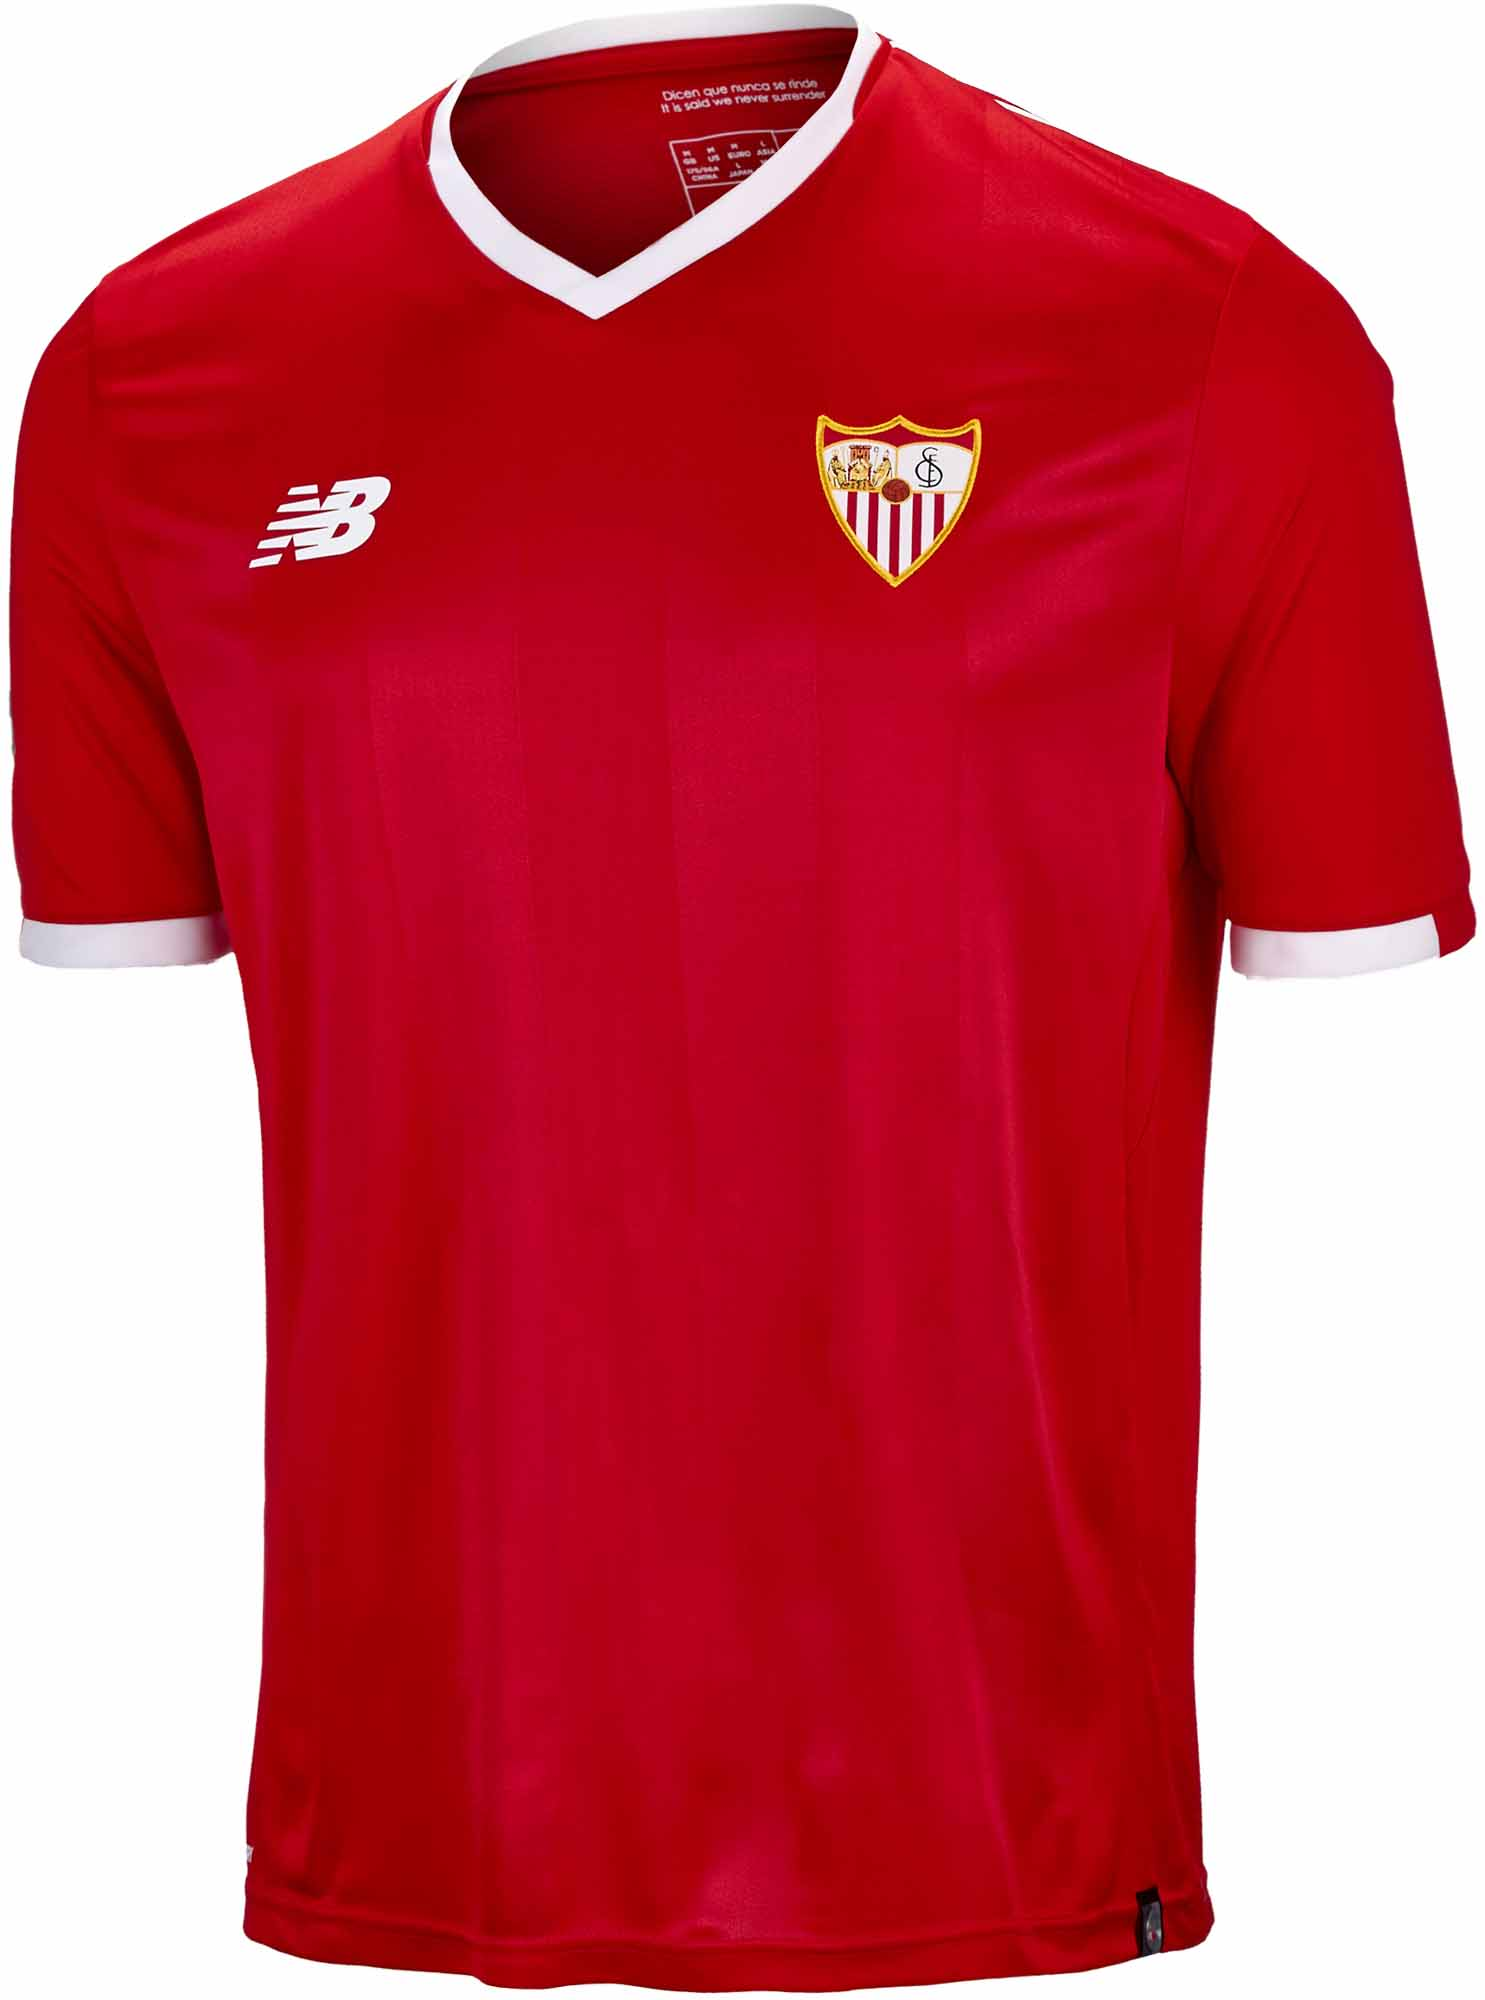 205782bd3 2017 18 New Balance Sevilla Away Jersey - SoccerPro.com